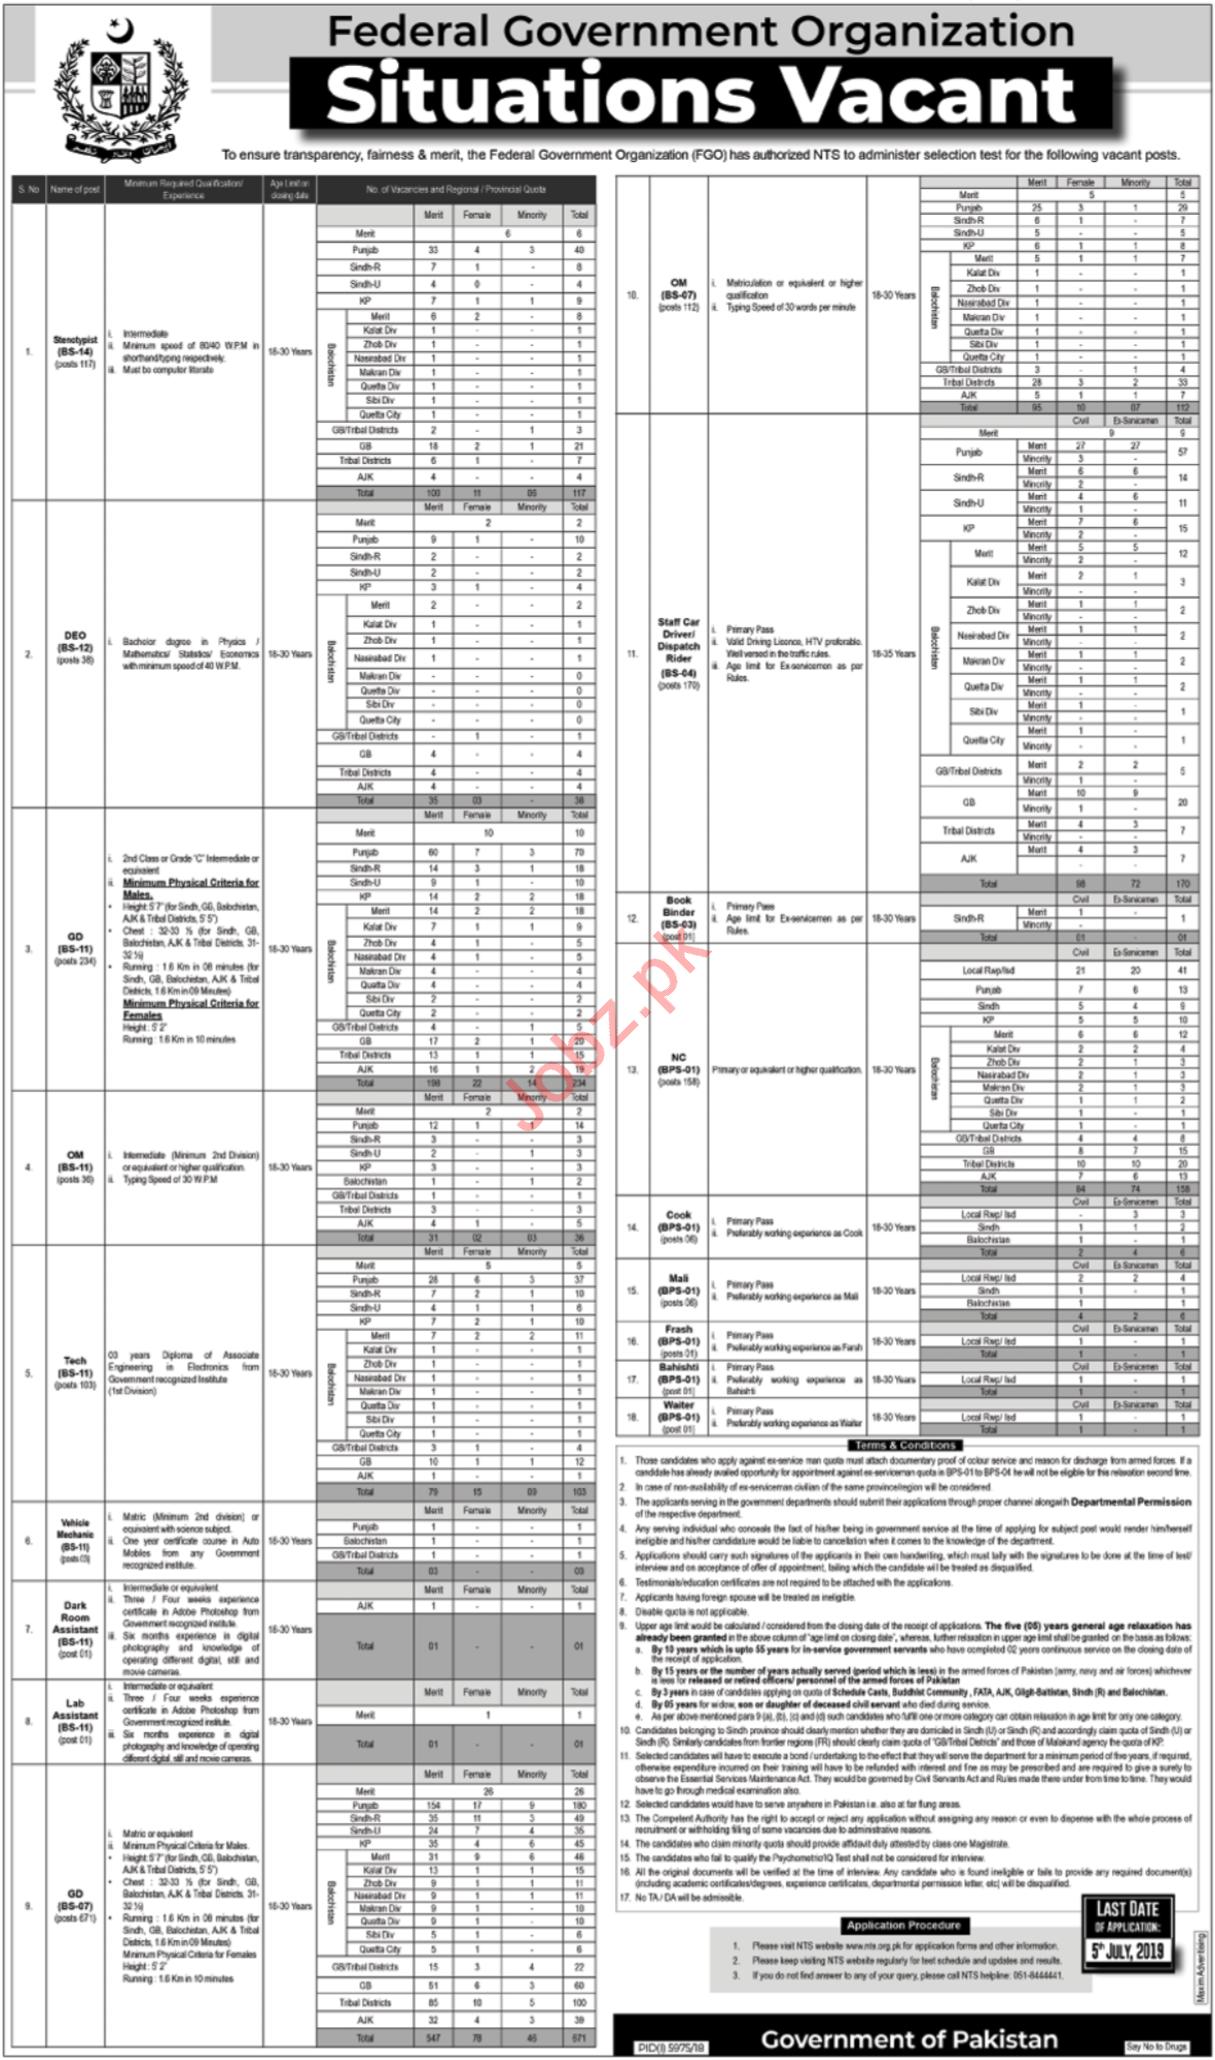 Federal Government Organization FGO Jobs 2019 via NTS